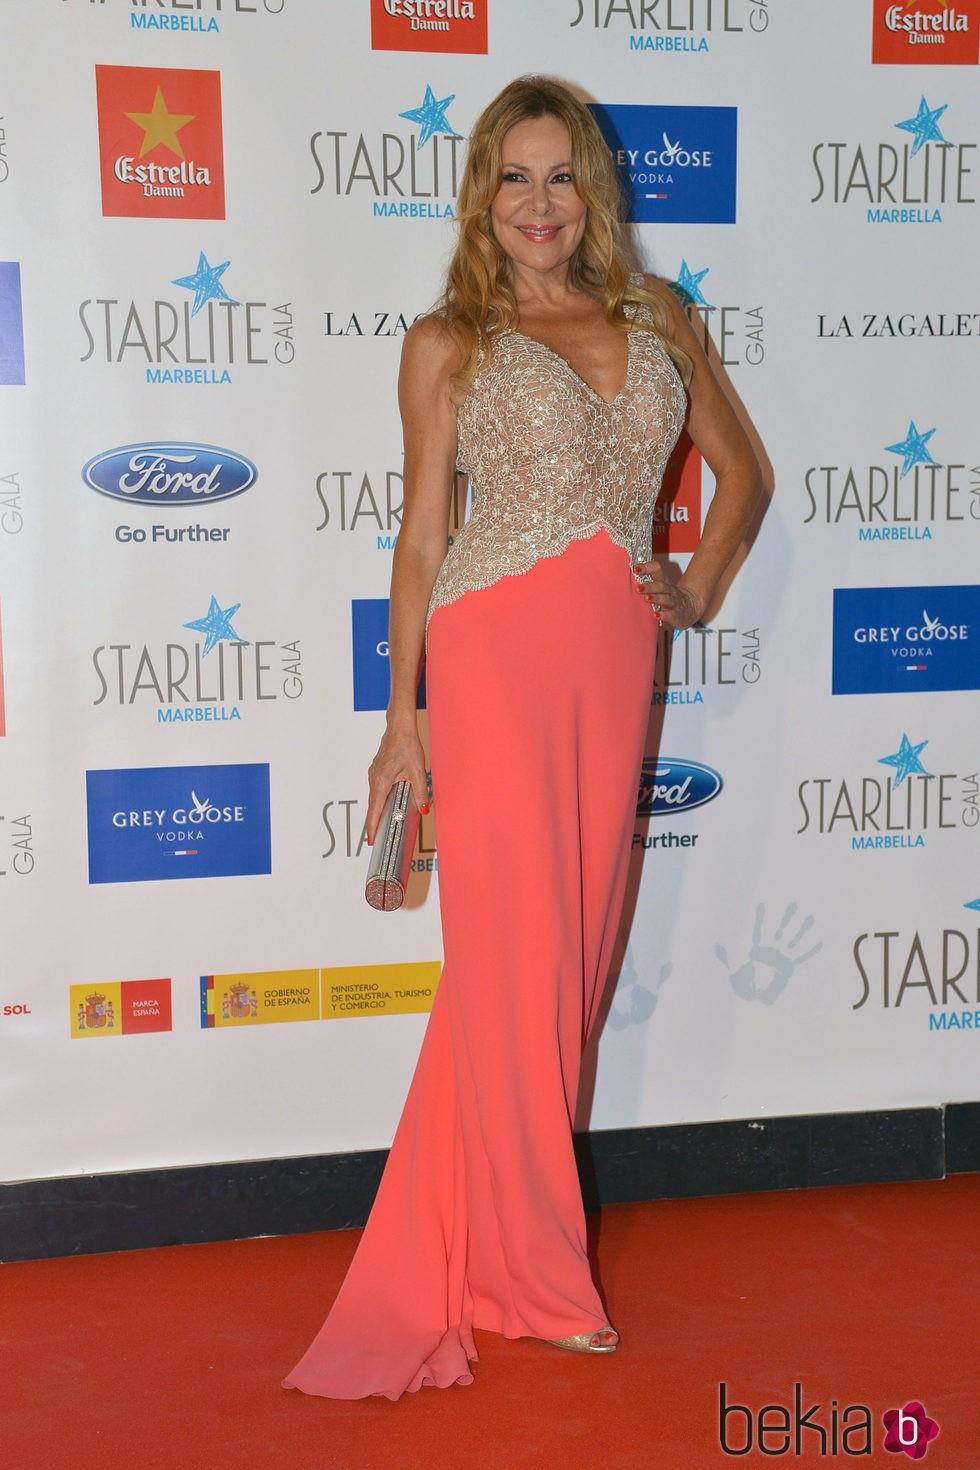 Ana Obregón en la Gala Starlite 2015